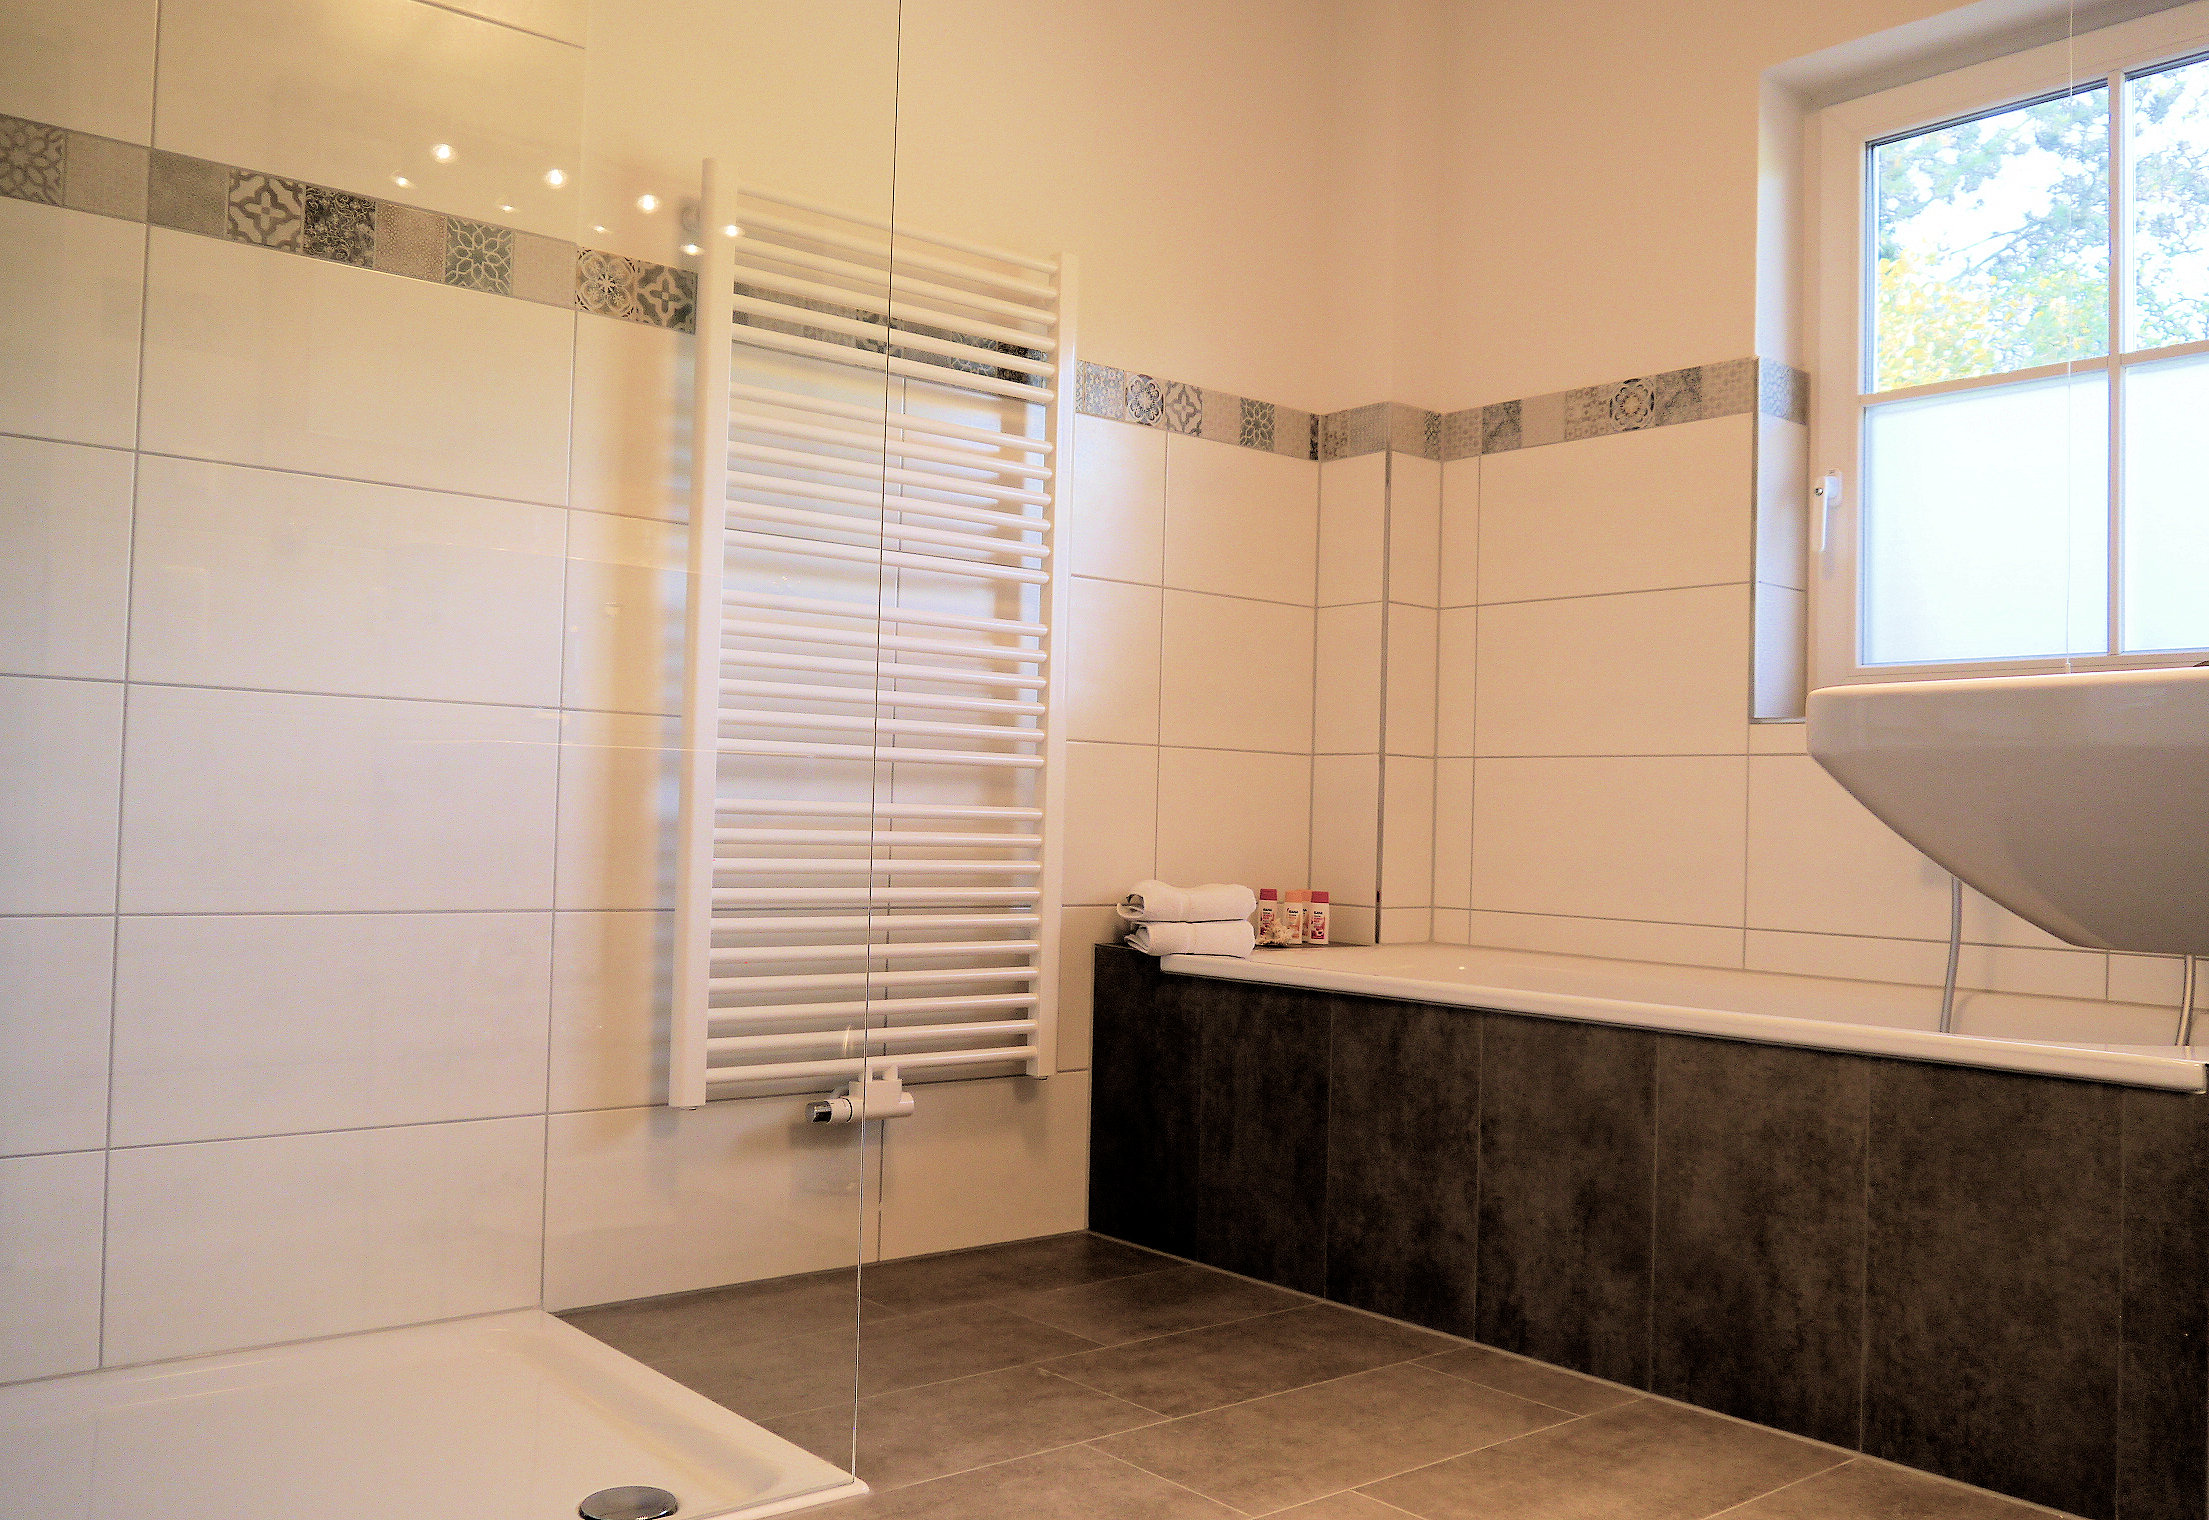 Apt. 1 Our spacious bathroom with bath tub and shower.